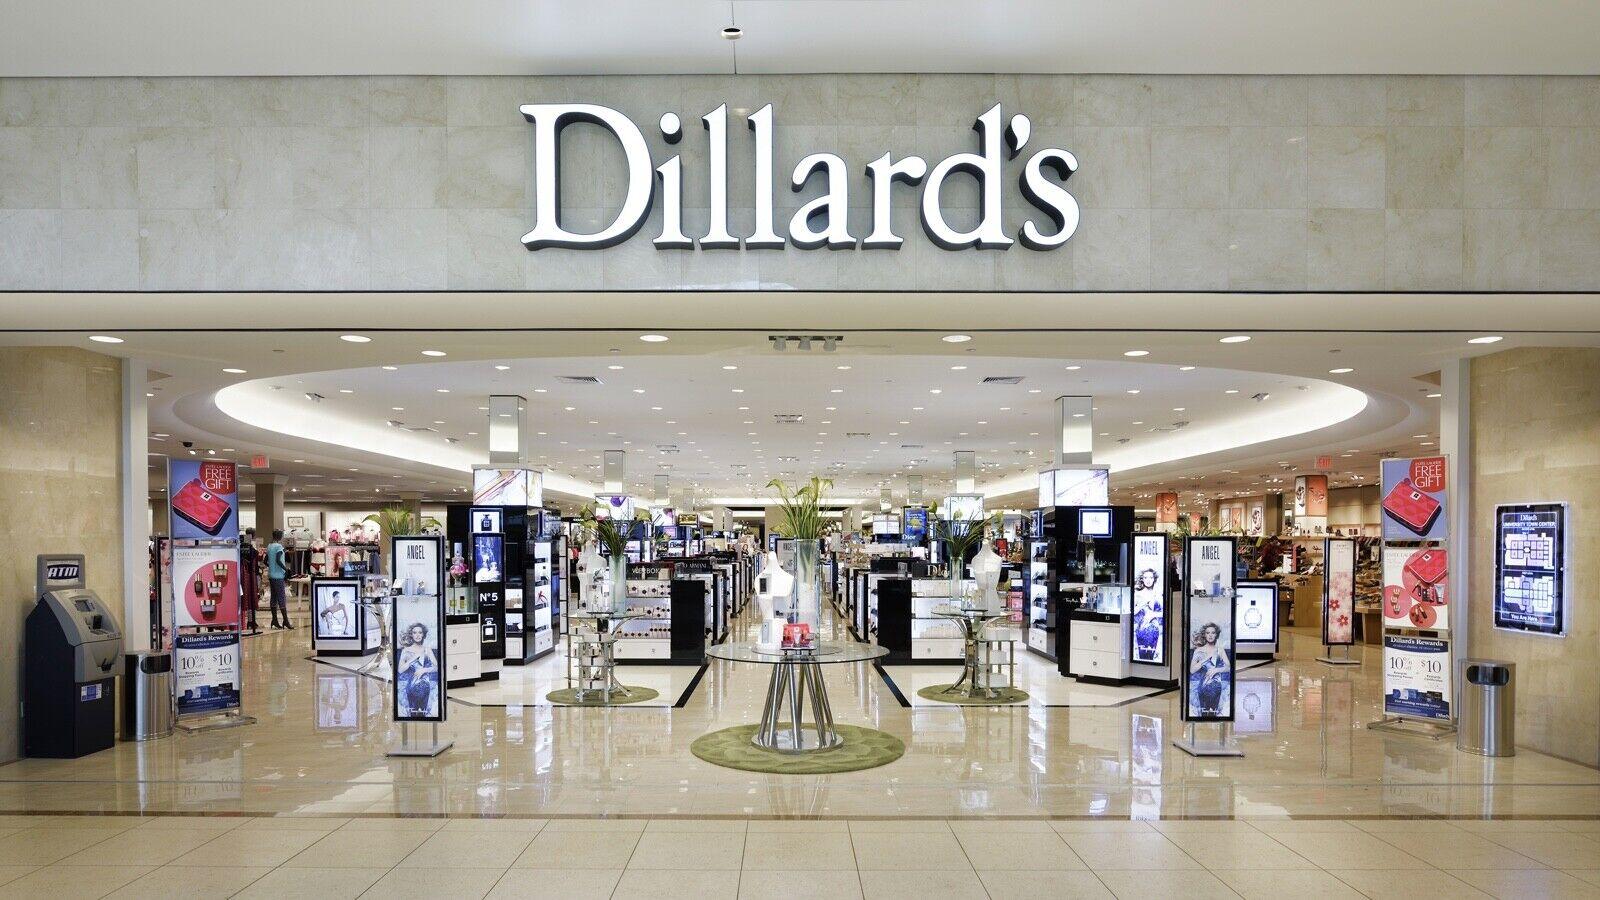 312.70 Dillard s Gift Card / Store Credit  - $280.00